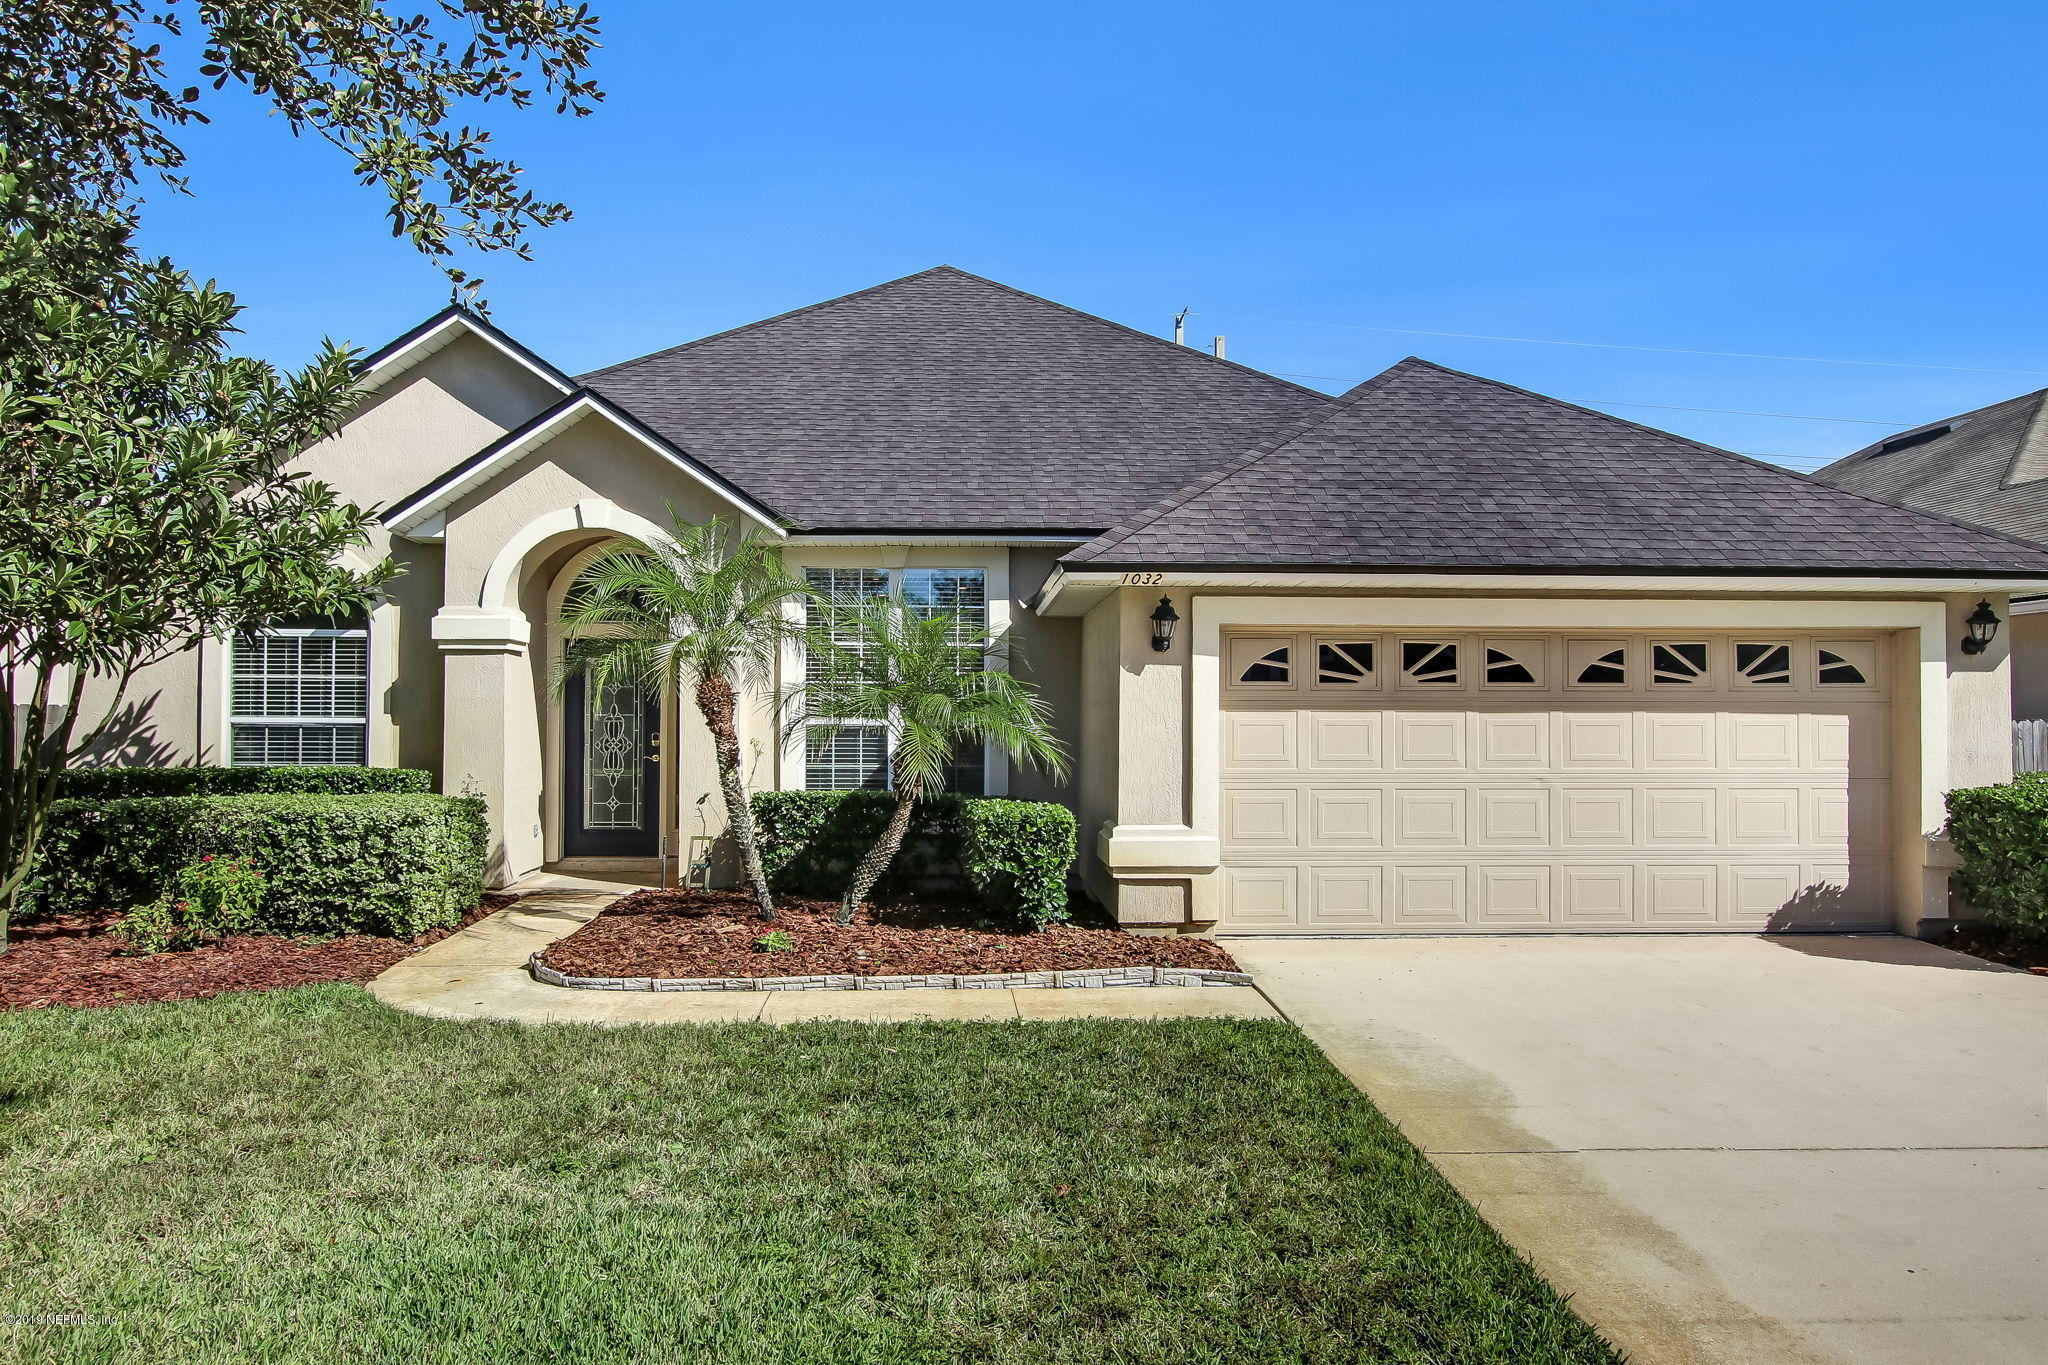 1032 DUNSTABLE, PONTE VEDRA, FLORIDA 32081, 3 Bedrooms Bedrooms, ,3 BathroomsBathrooms,Residential - single family,For sale,DUNSTABLE,1022291